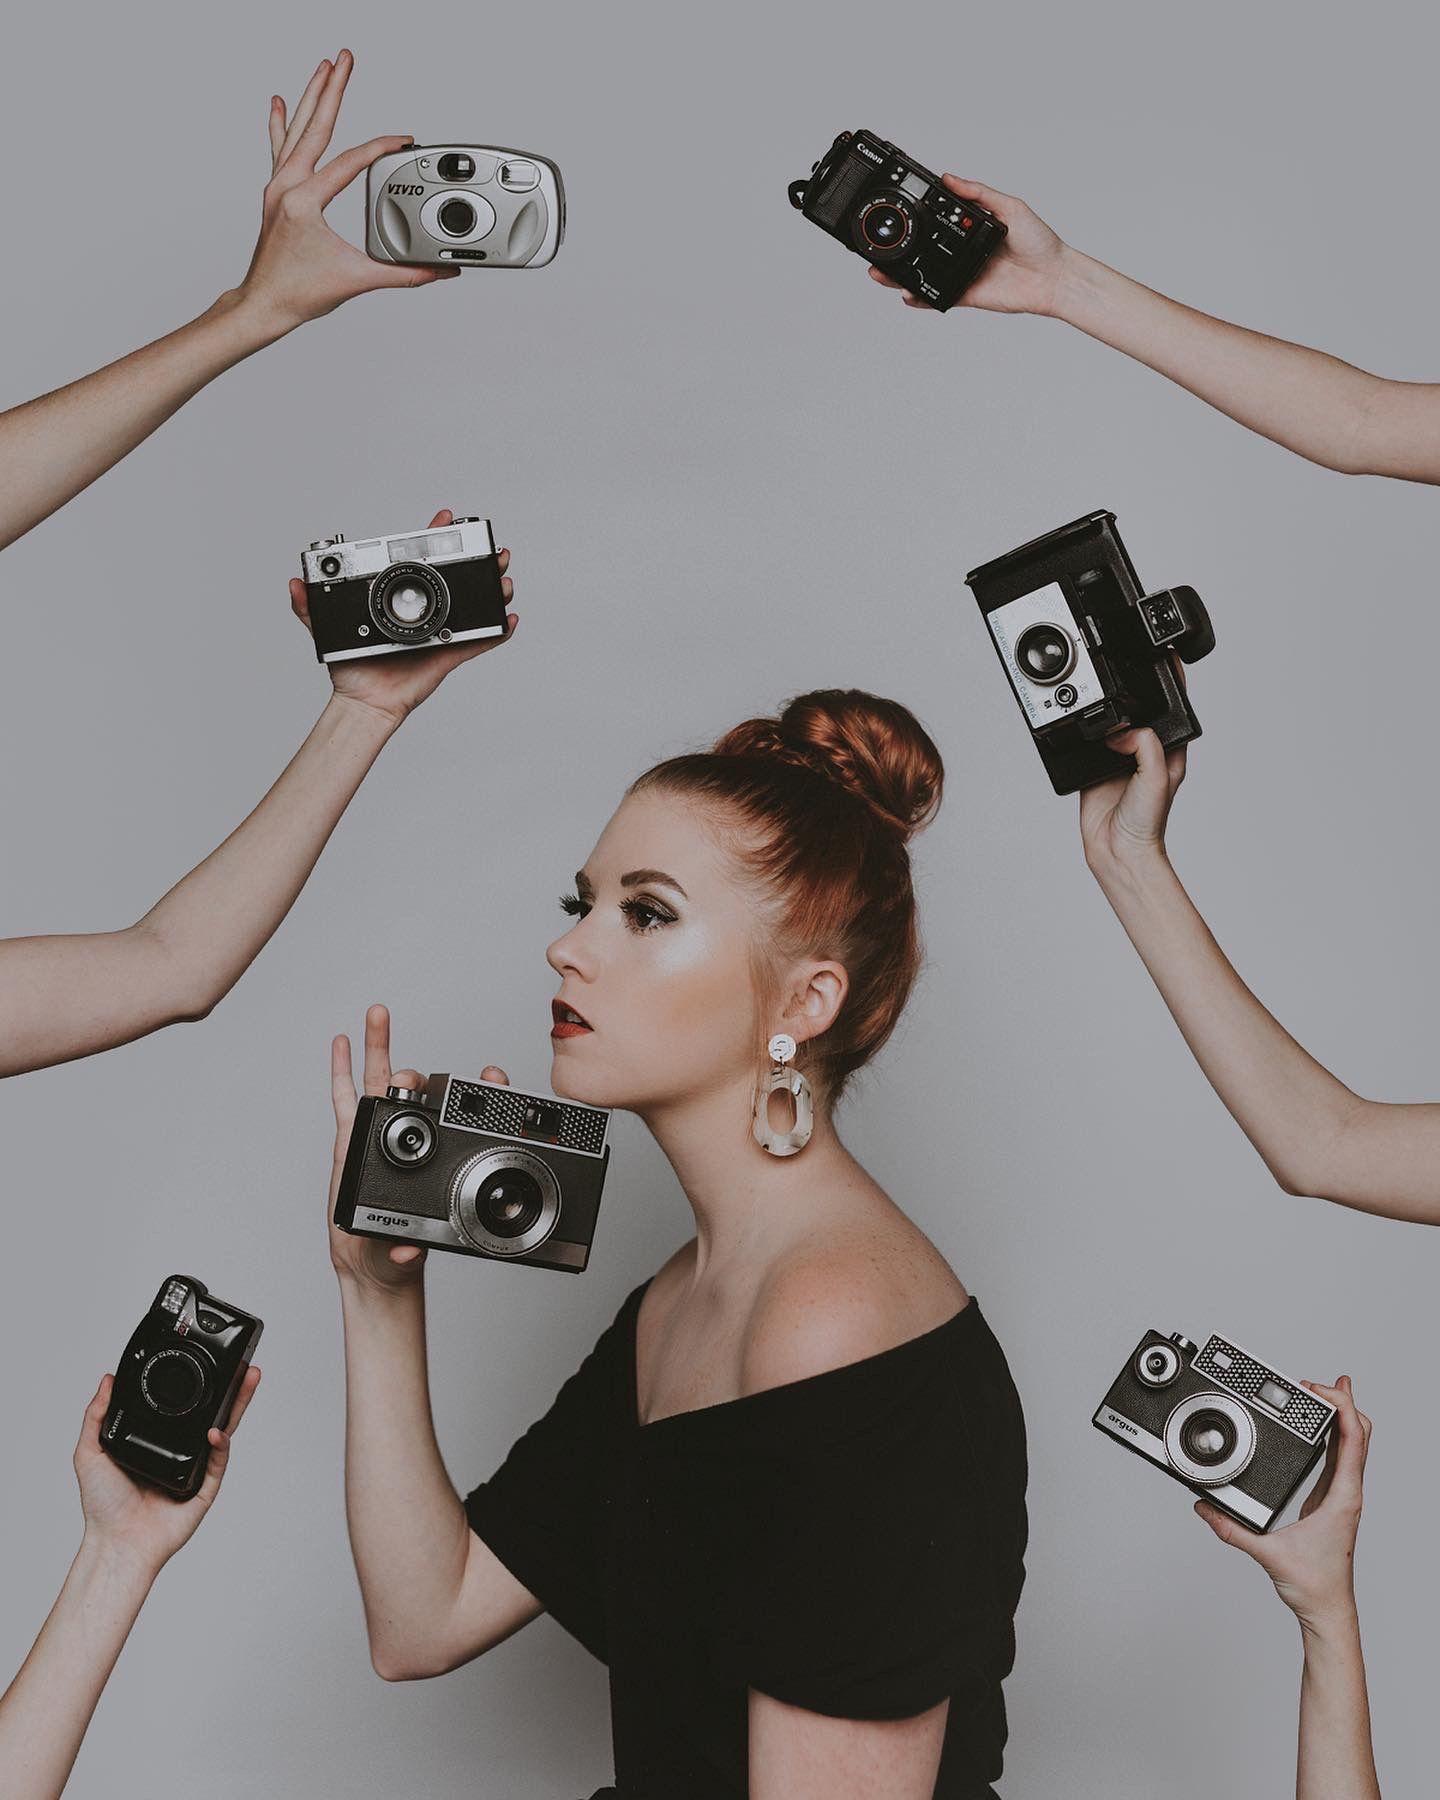 Camera Hands Photoshoot Marina Williams Portrait Photography Poses Photography Inspiration Creative Expressions Photography